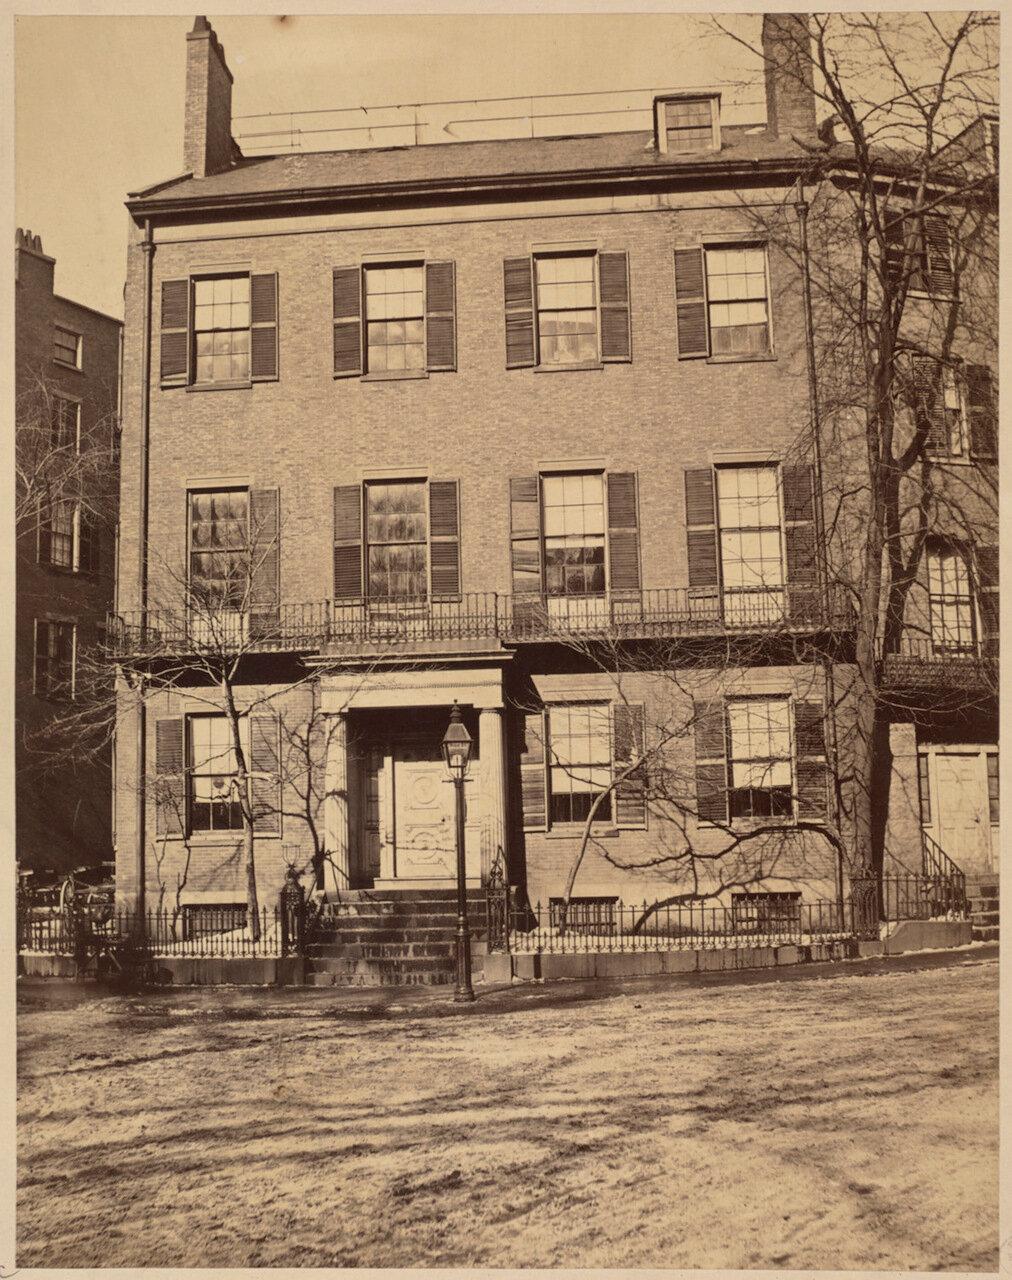 1860 - 1865